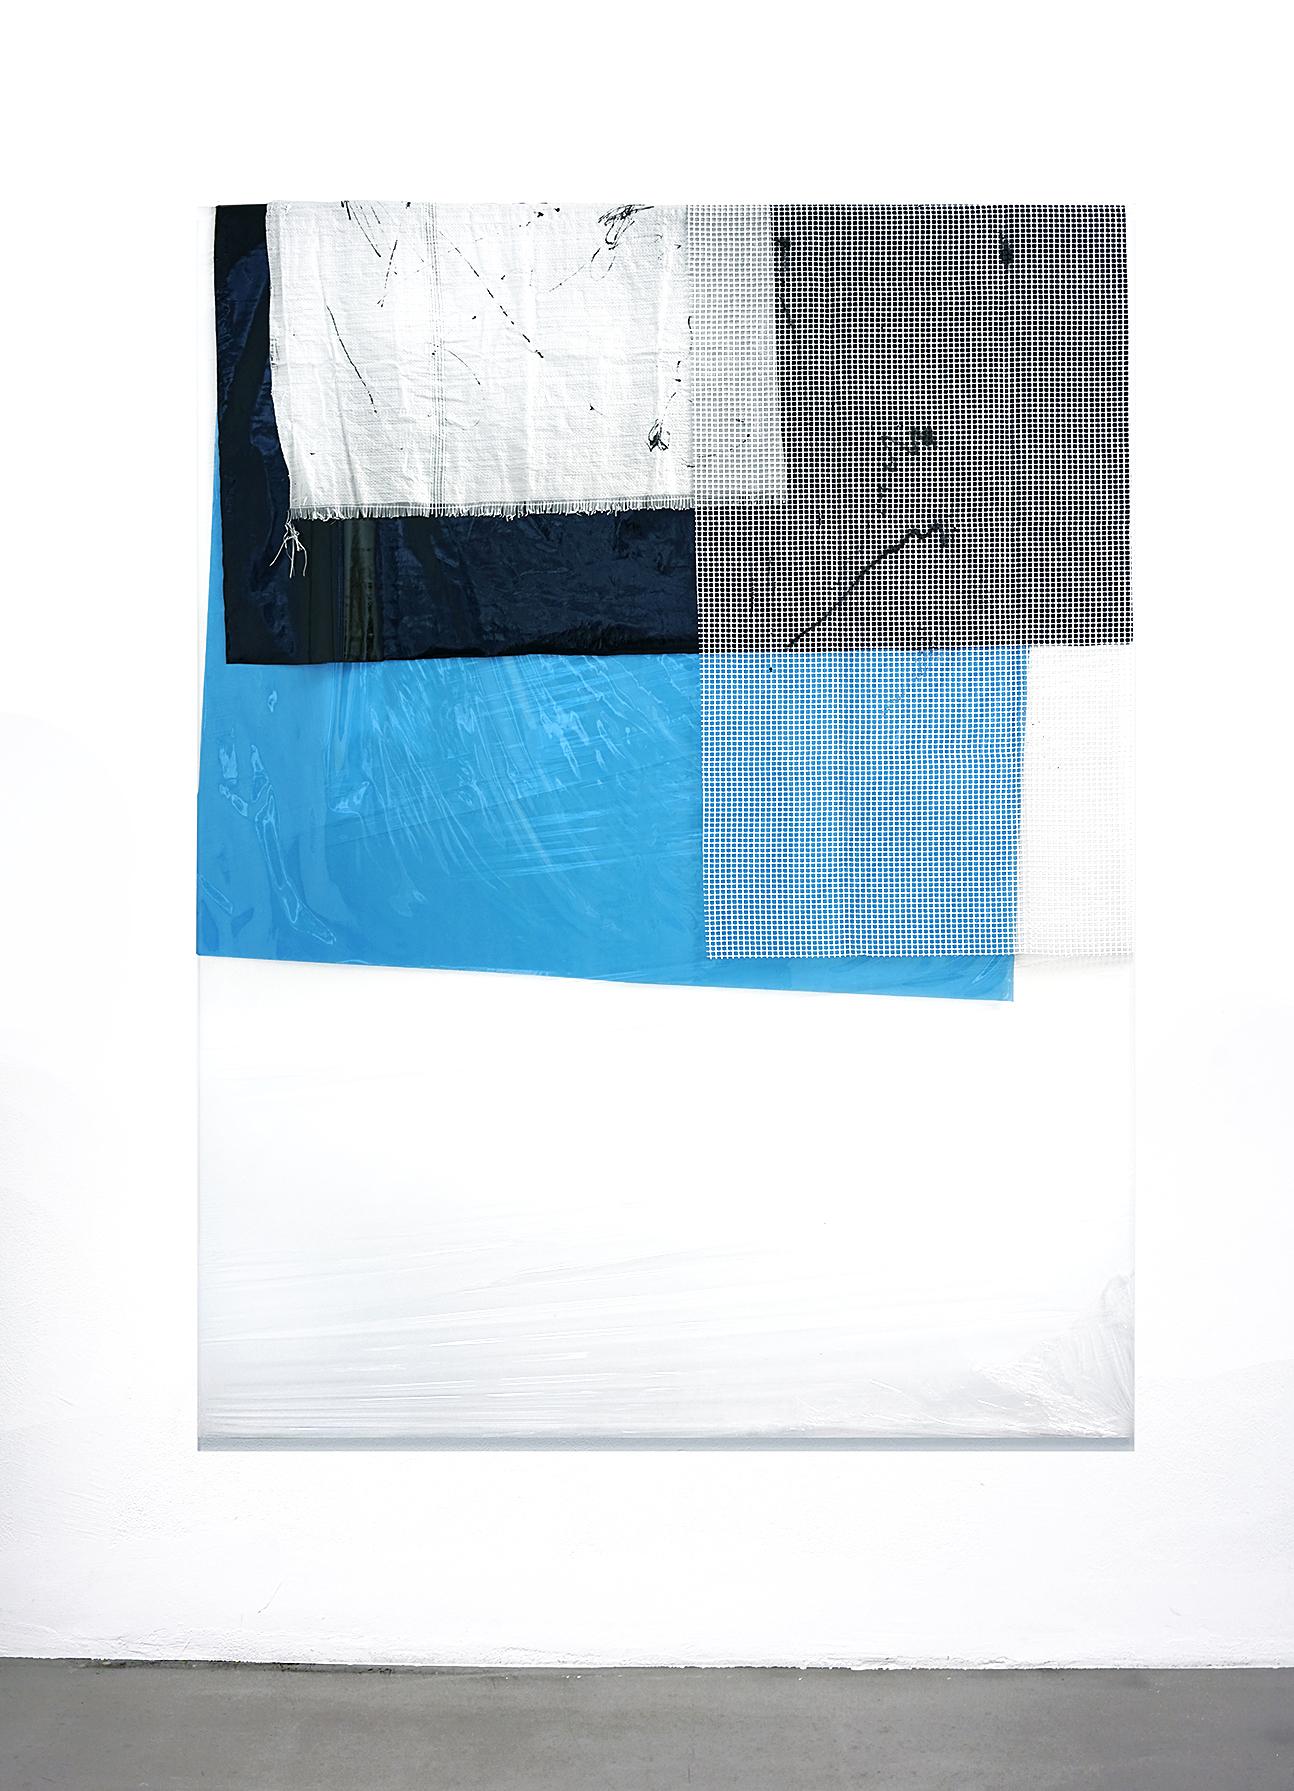 190201 | 2016 | Acryl, Lack, Sprühfarbe, PE Folie auf Leinwand | 200 x 150 cm | ©GALERIE ALBER